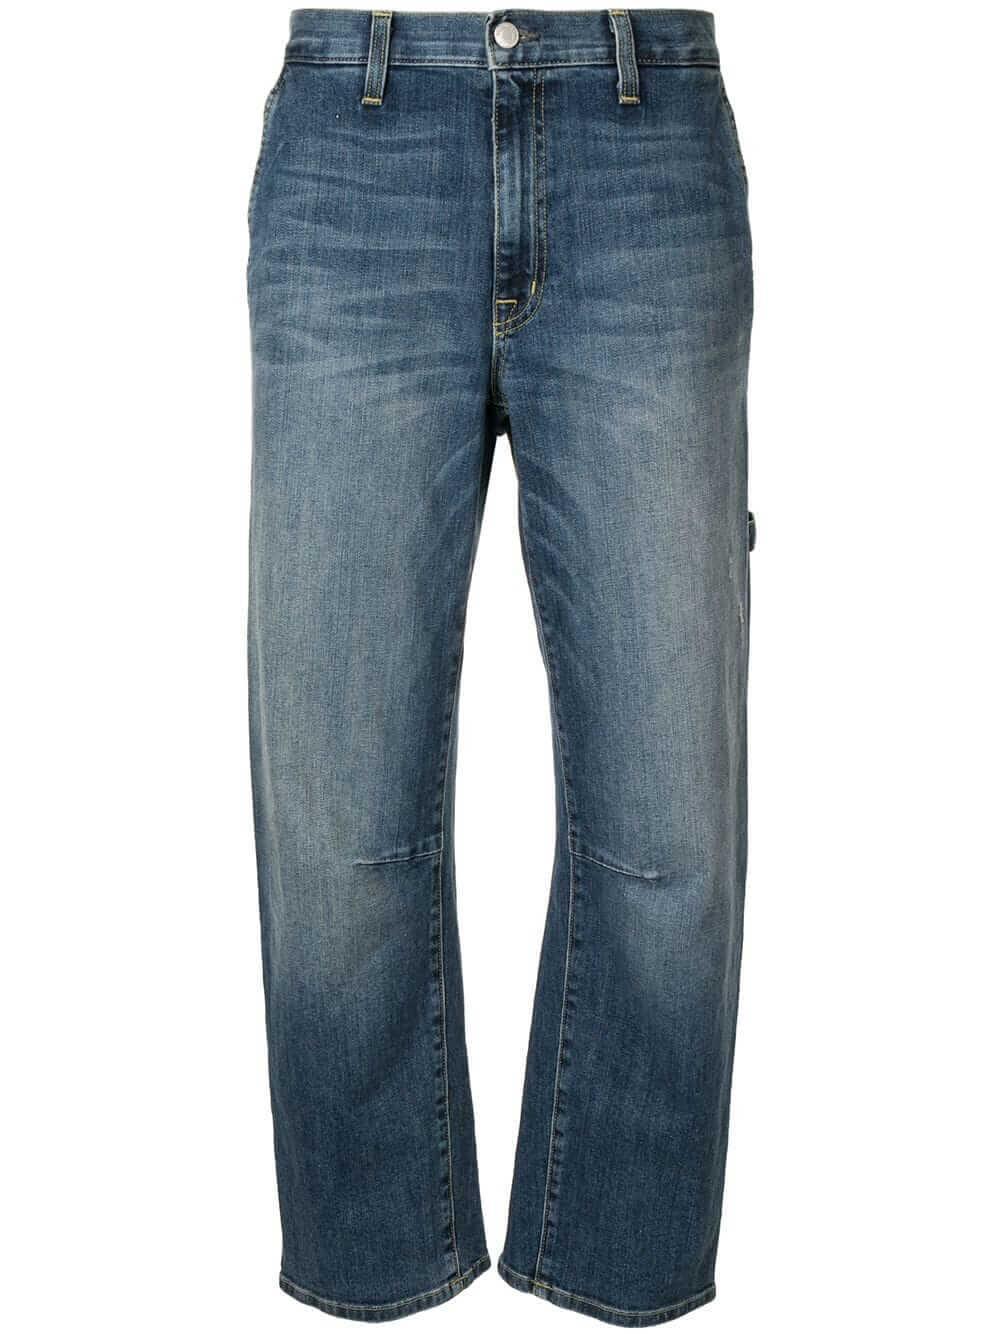 Carpenter Jeans Item # 10883-W45